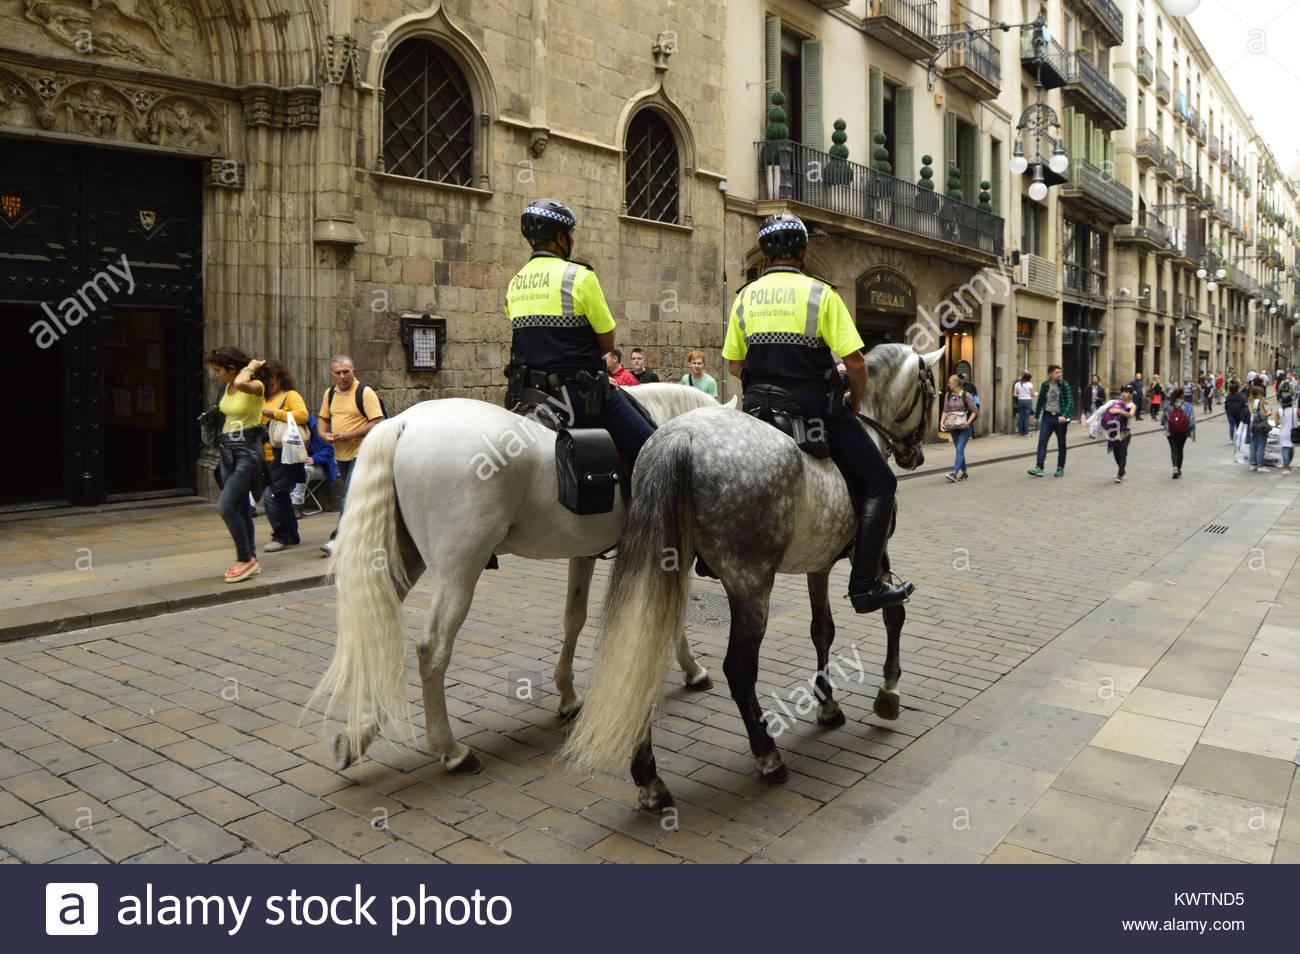 Policemen on horses in Ciutat Vella Barcelona Spain Europe - Stock Image